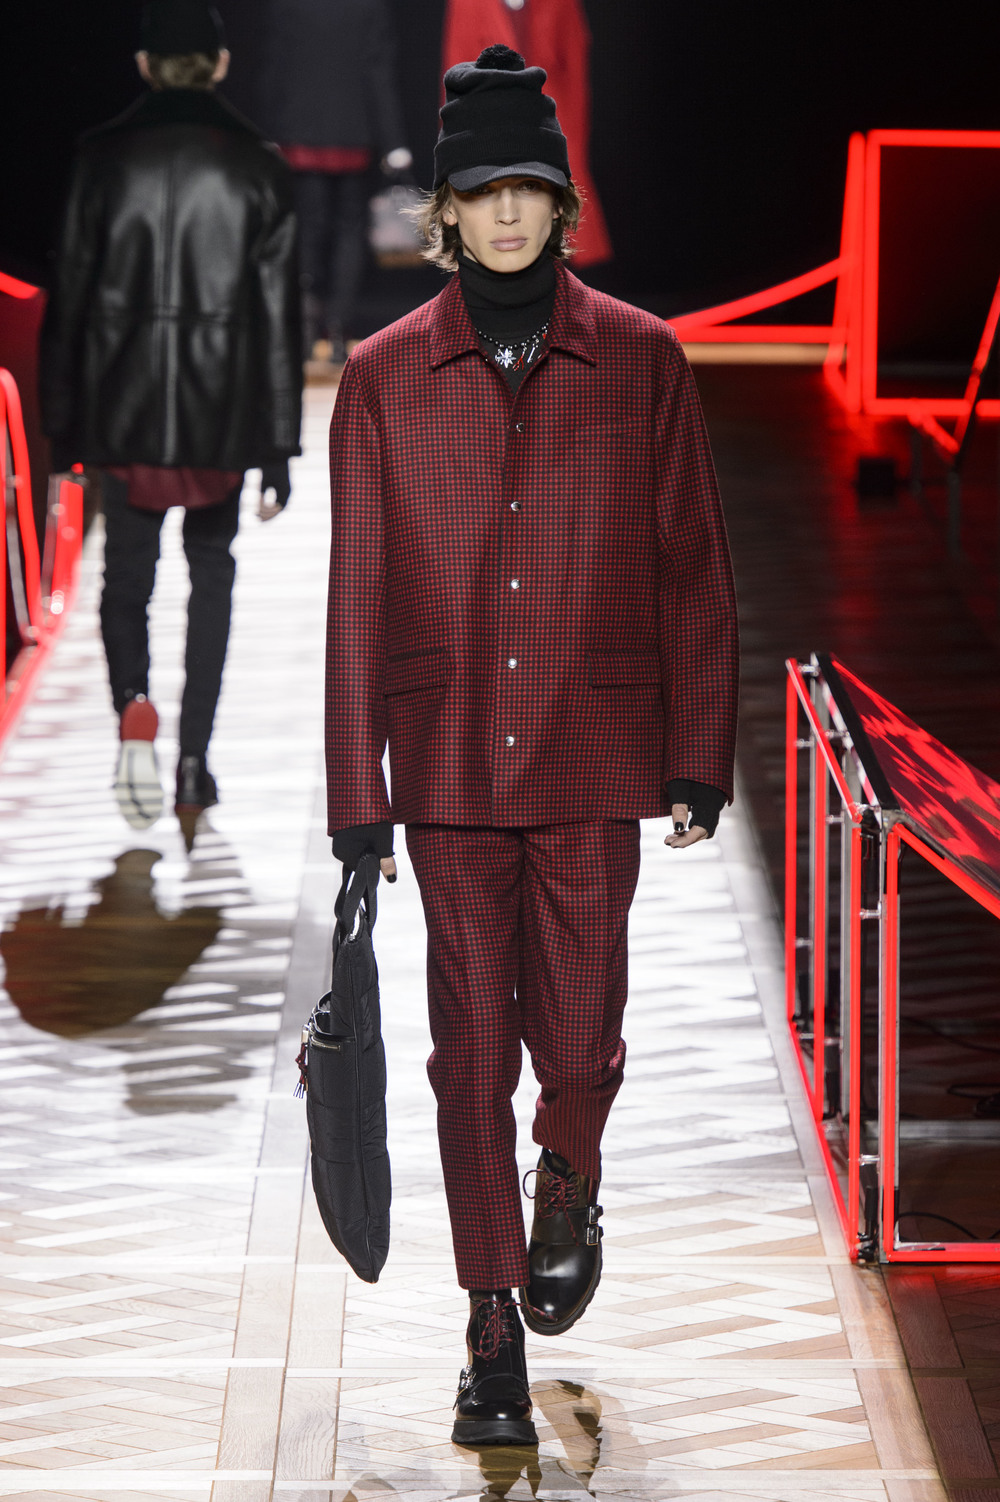 Dior_Homme_Hiver2016-17_look_18.JPG